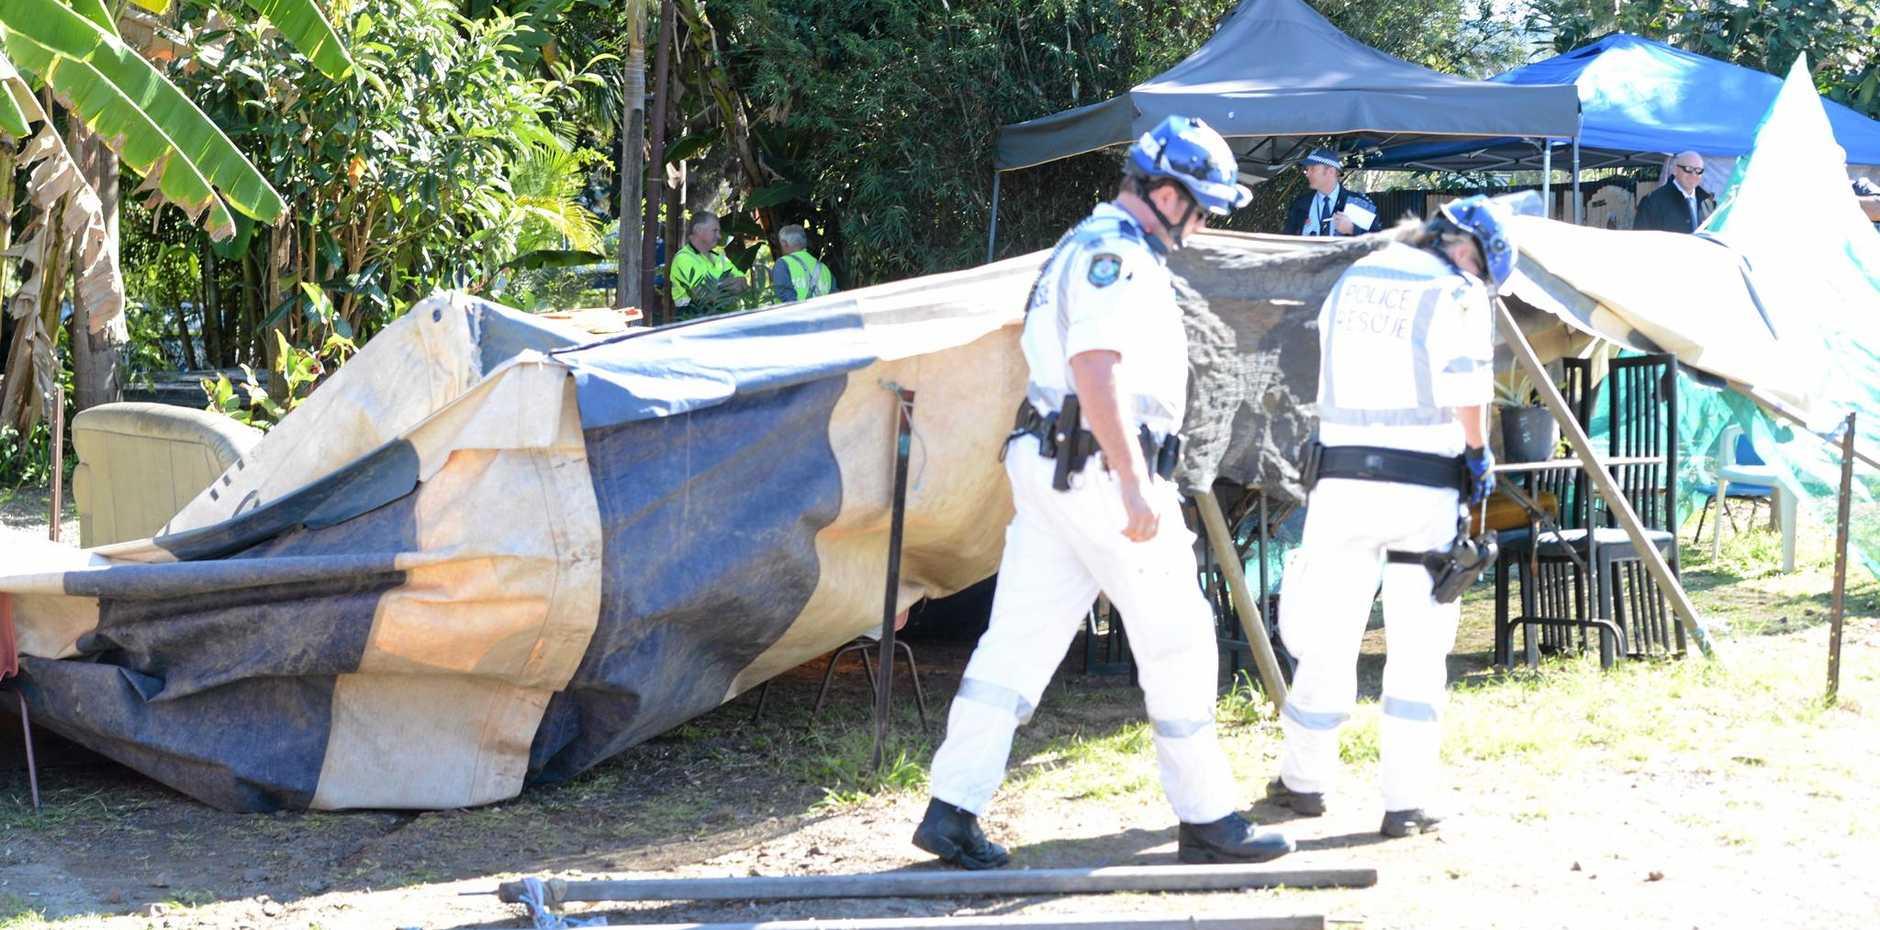 Police undertook a drug raid on the streets of Nimbin yesterday morning.